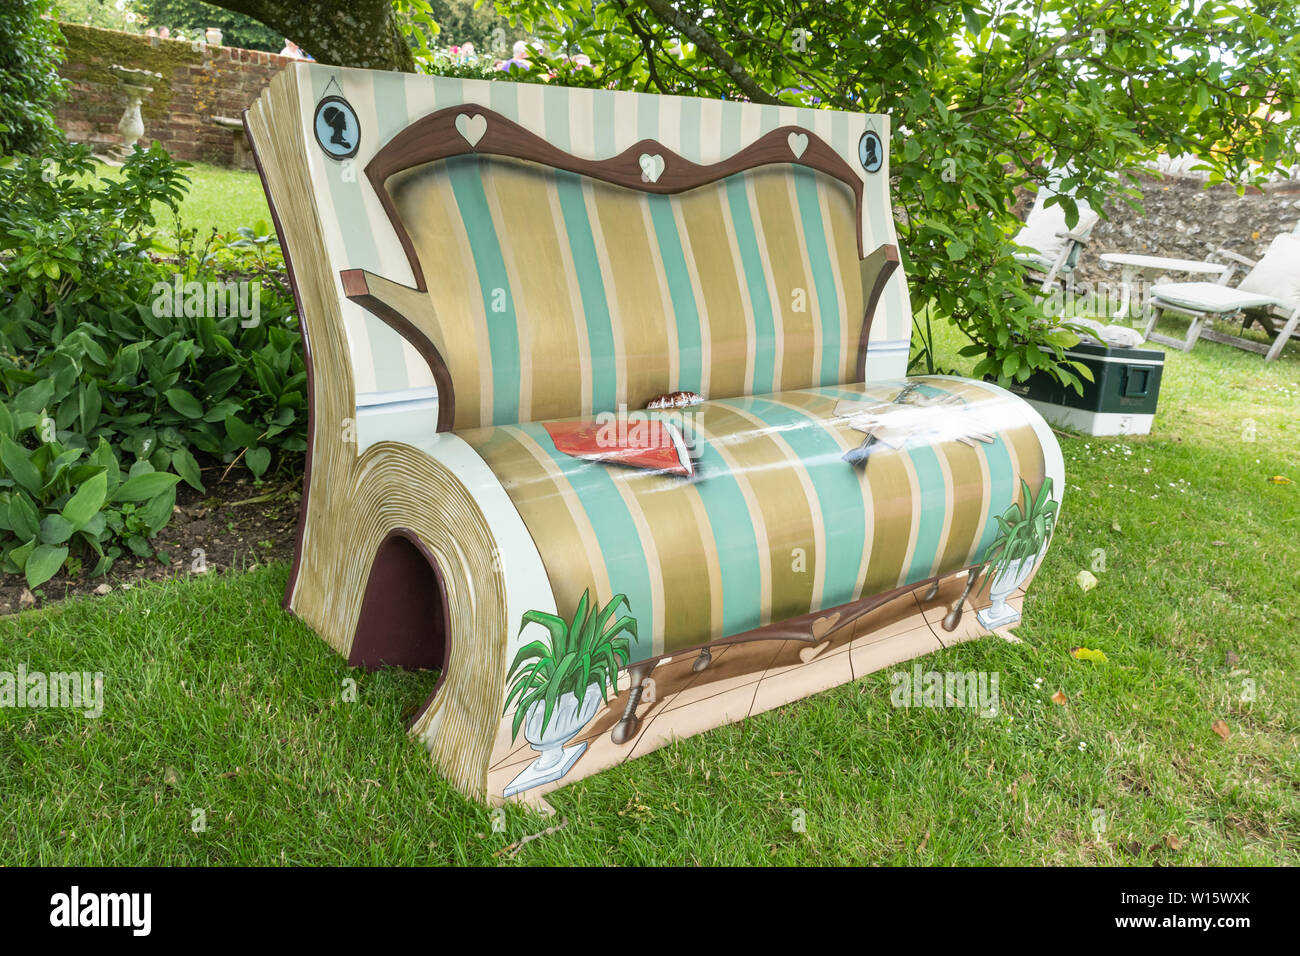 Picture of: Garden Seat Unusual Fotos E Imagenes De Stock Alamy